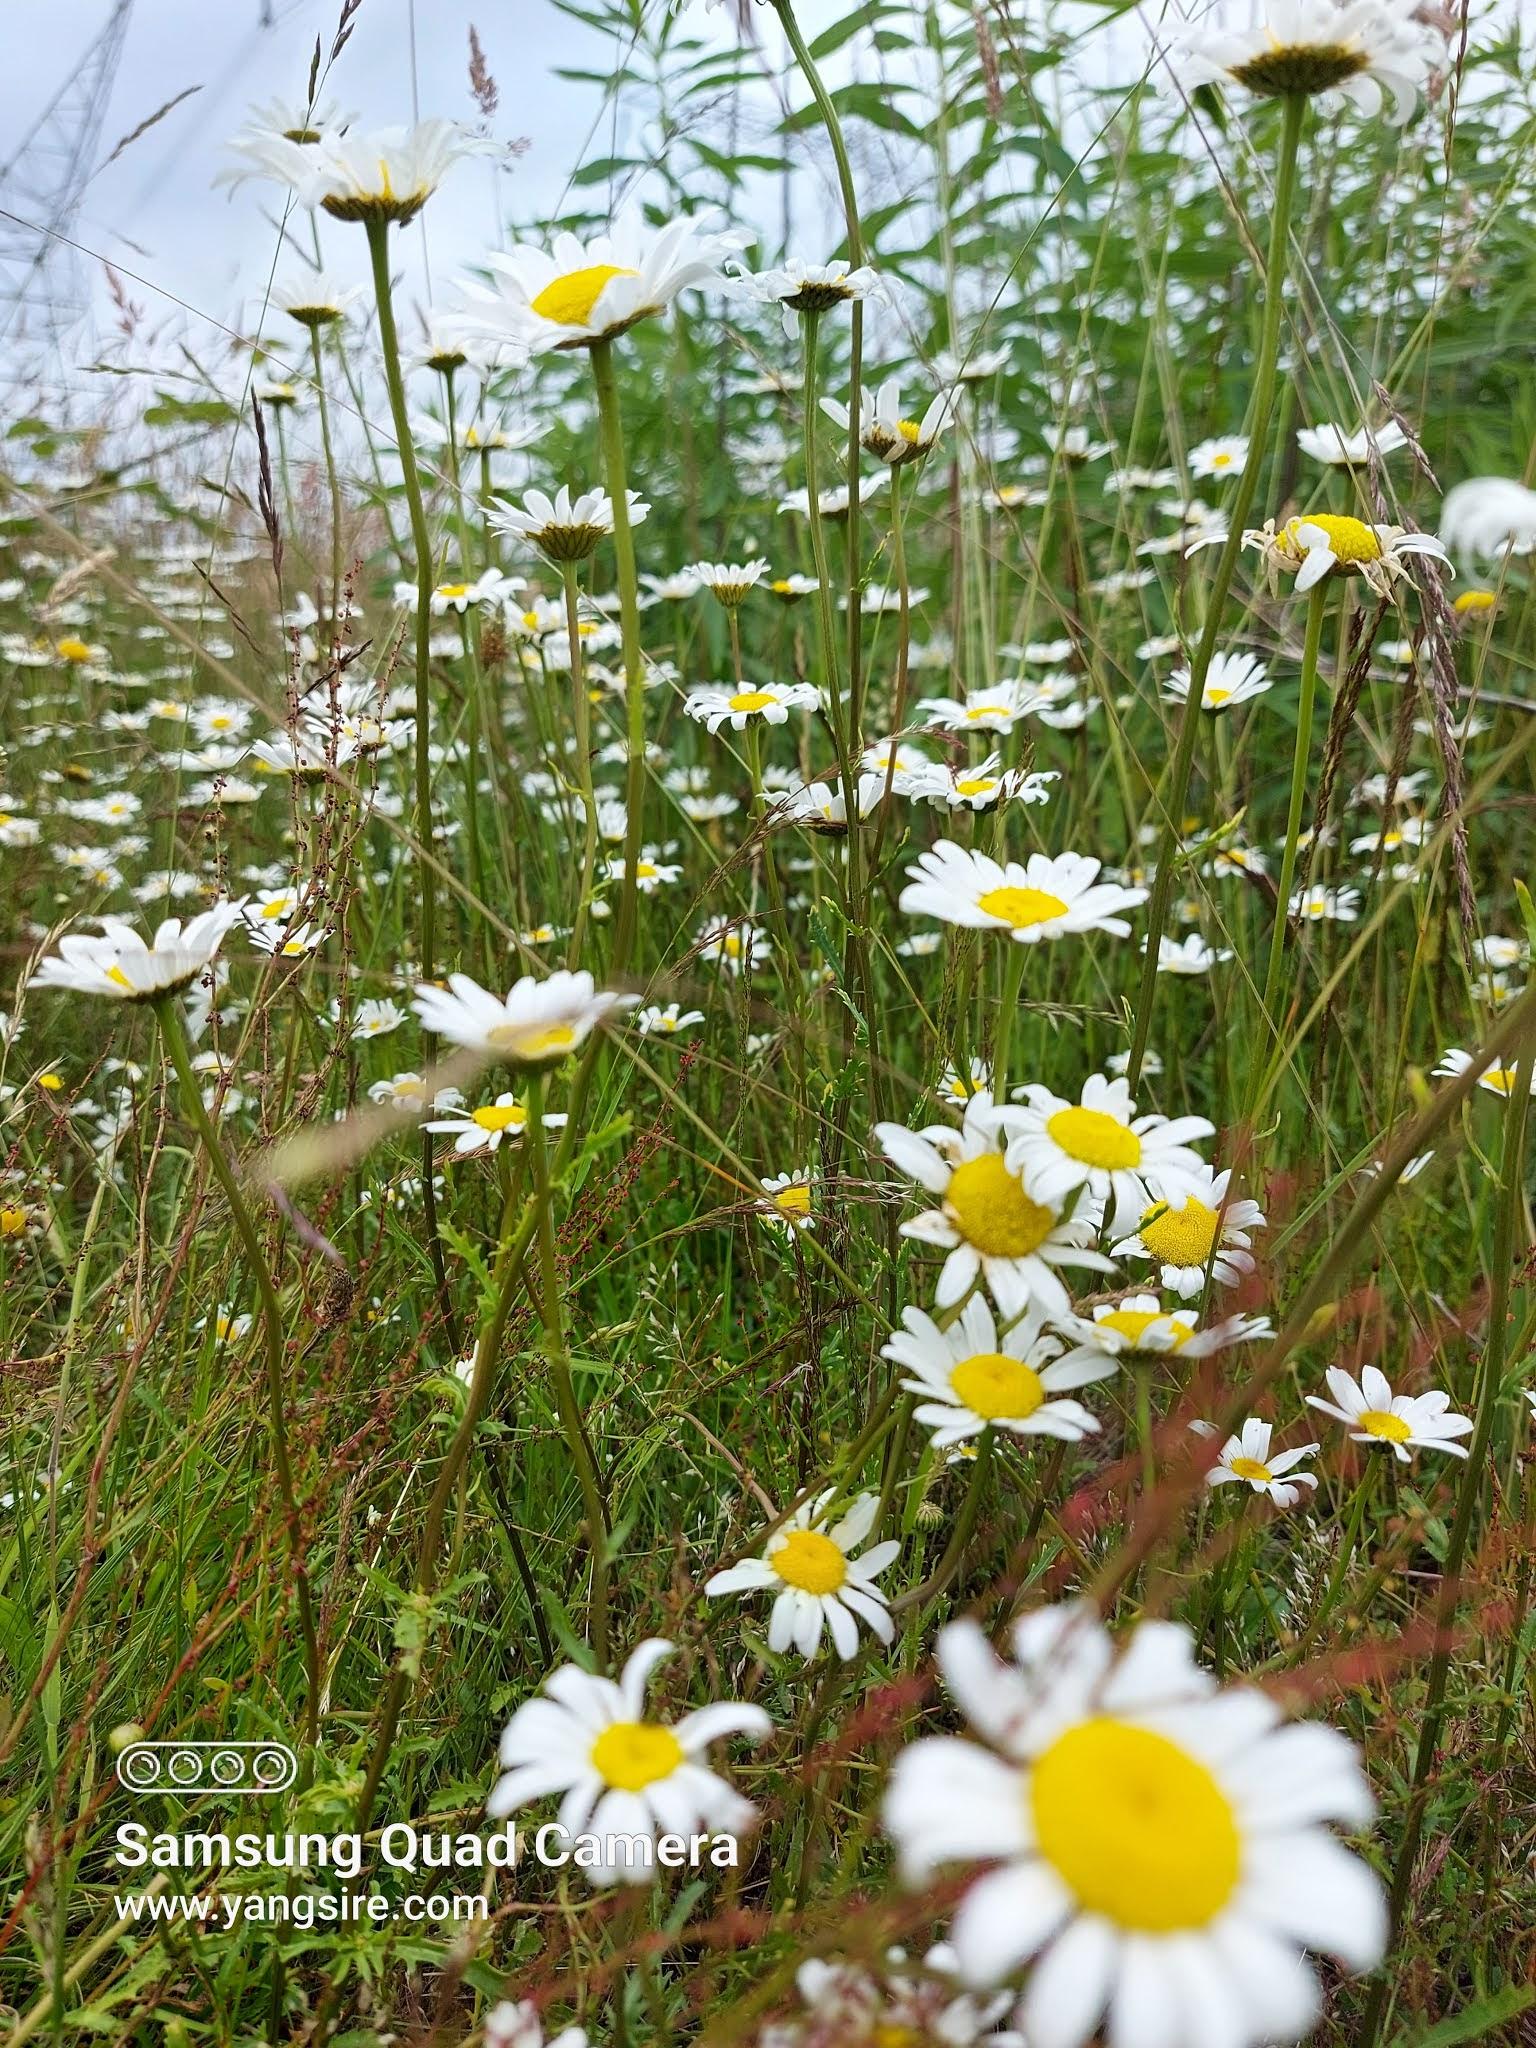 Field with full of Daisy